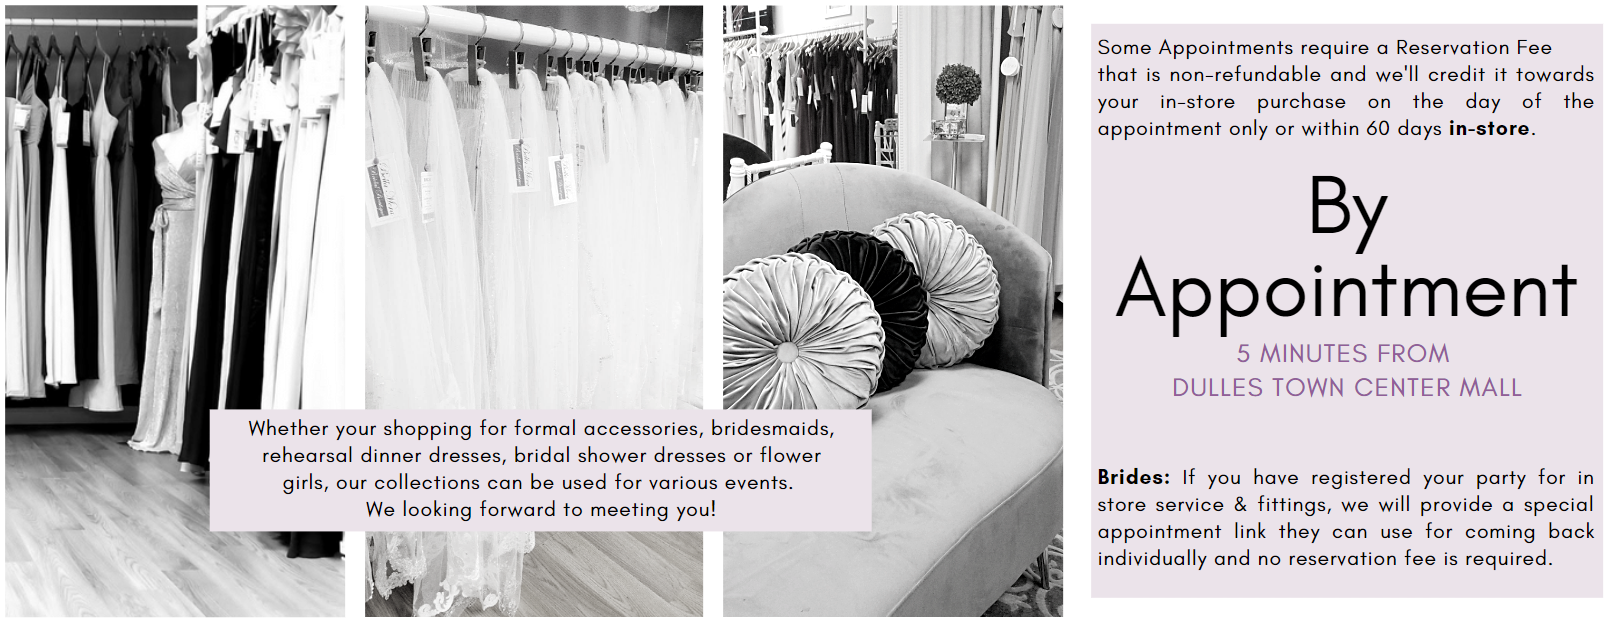 appointments-bella-mera-bridal-bridesmaids-wedding-veil-store-sterling-virginia.png